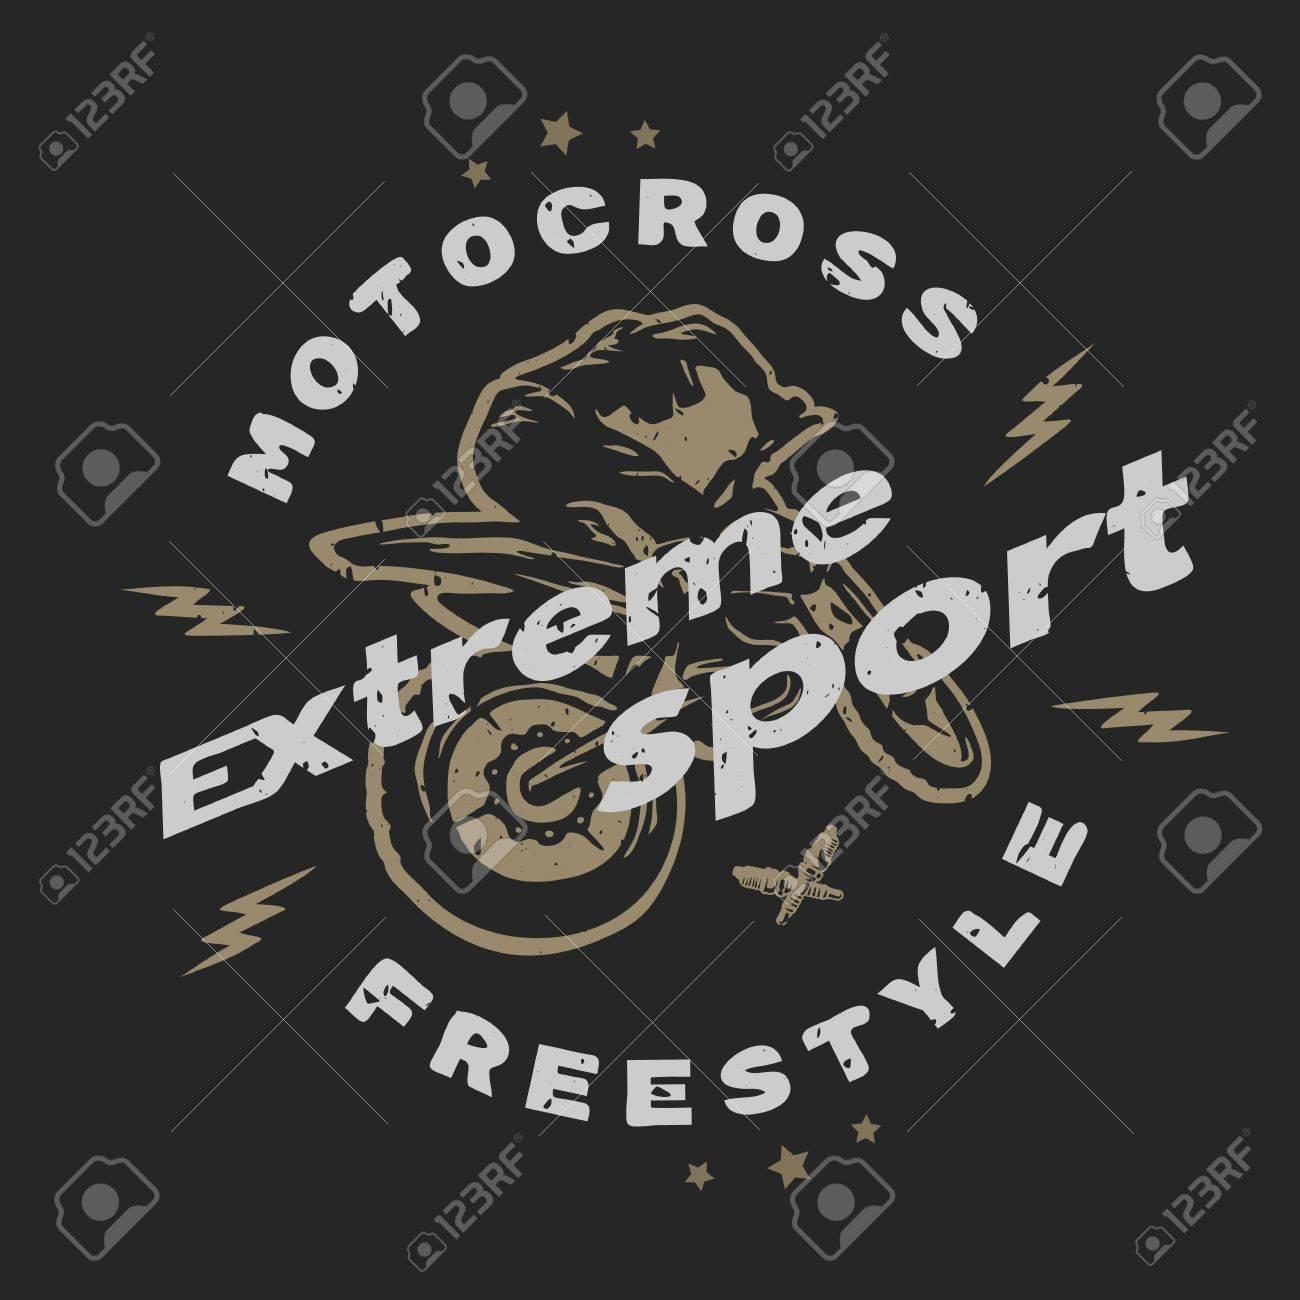 Design t shirt motocross - Motocross Extreme Sport Emblem T Shirt Design For A Dark Background